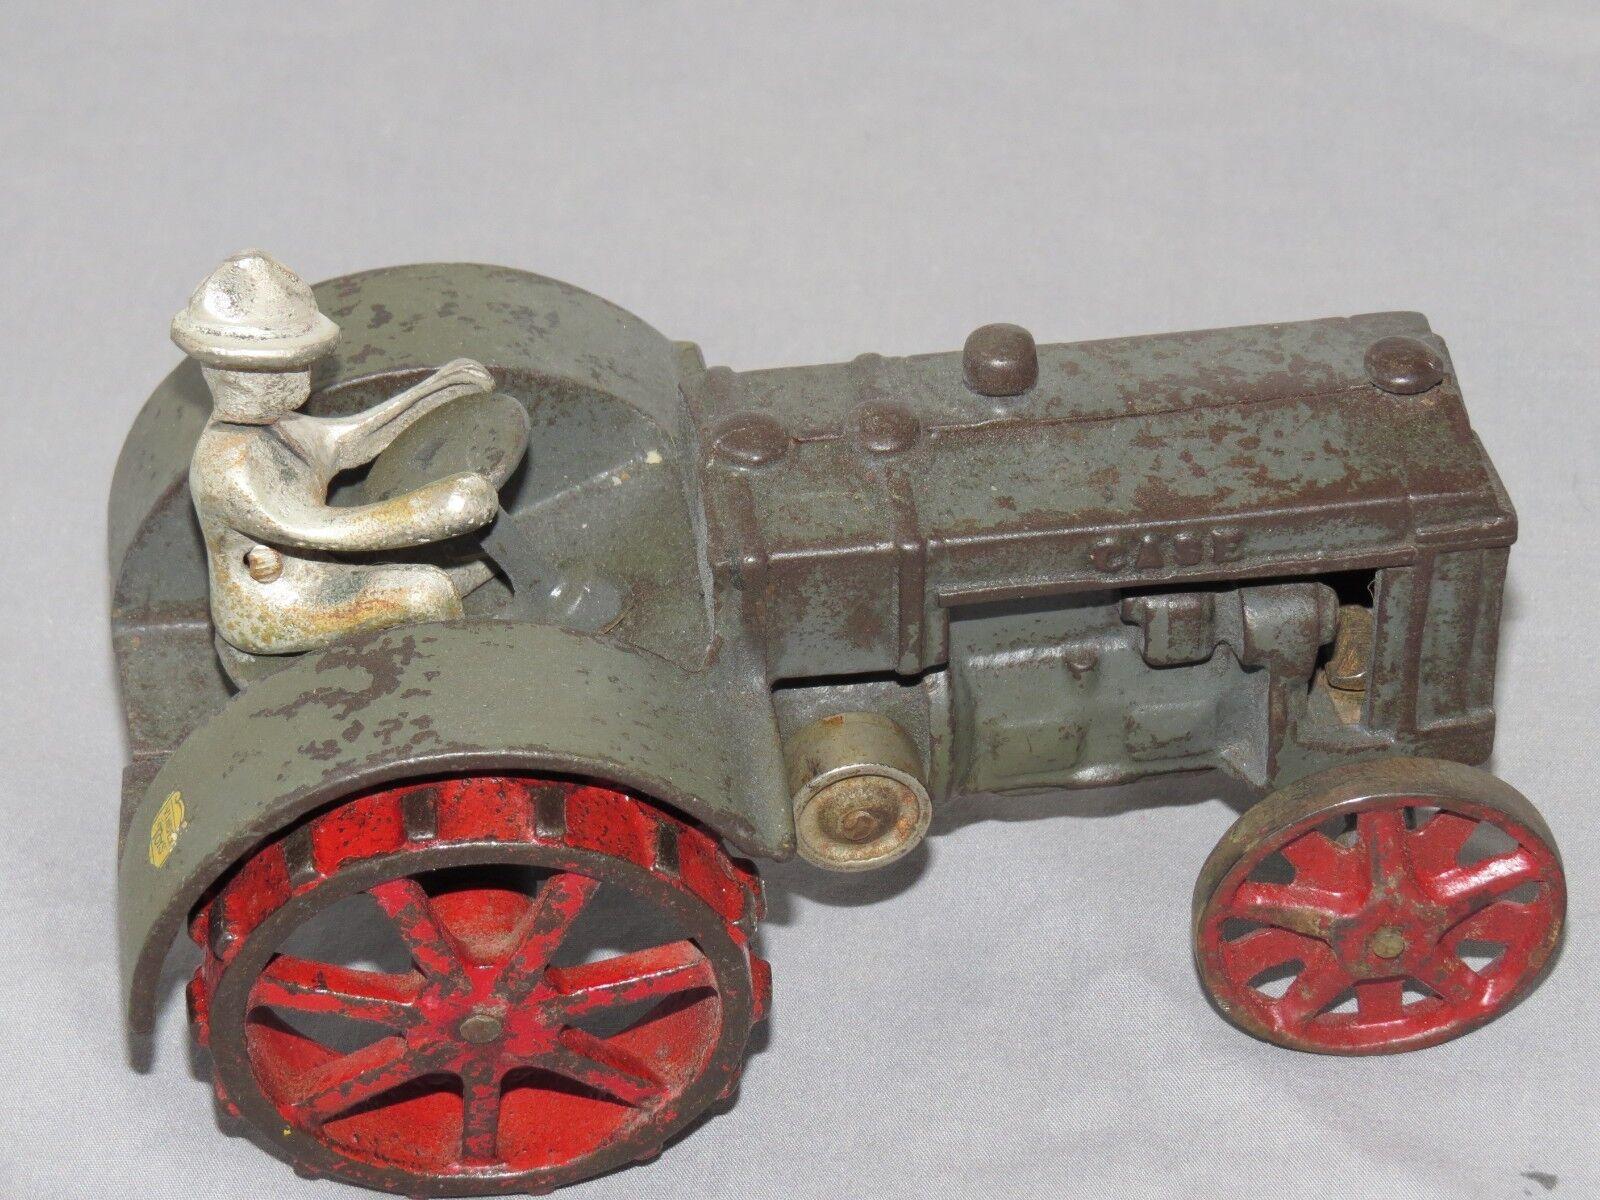 Vintage JI CASE Toy Tractor VINDEX Toys Original 1 16 1920's Cast Iron